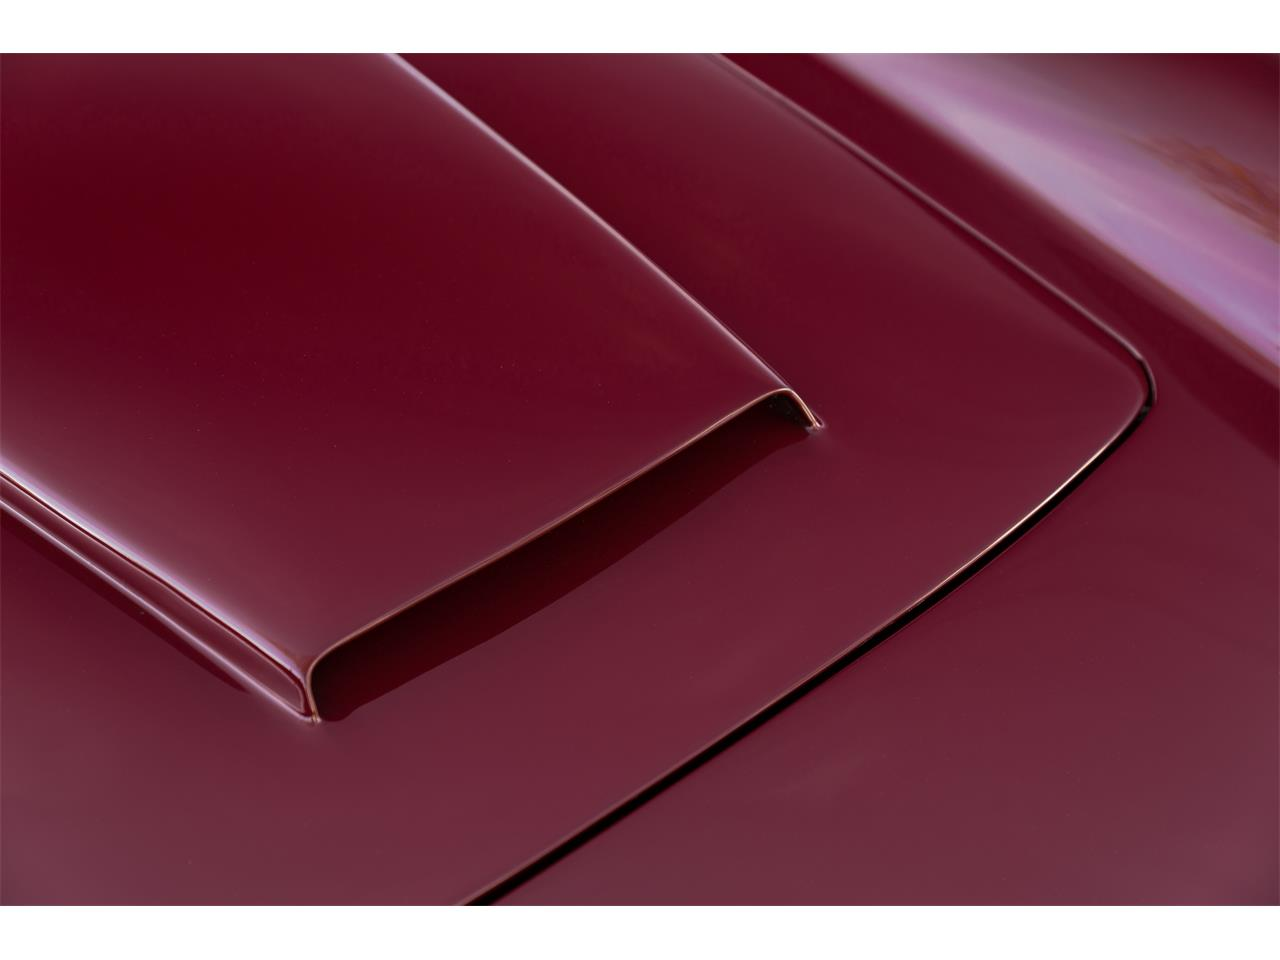 Large Picture of Classic '63 3500GT located in Pontiac Michigan - $175,000.00 - Q5FX